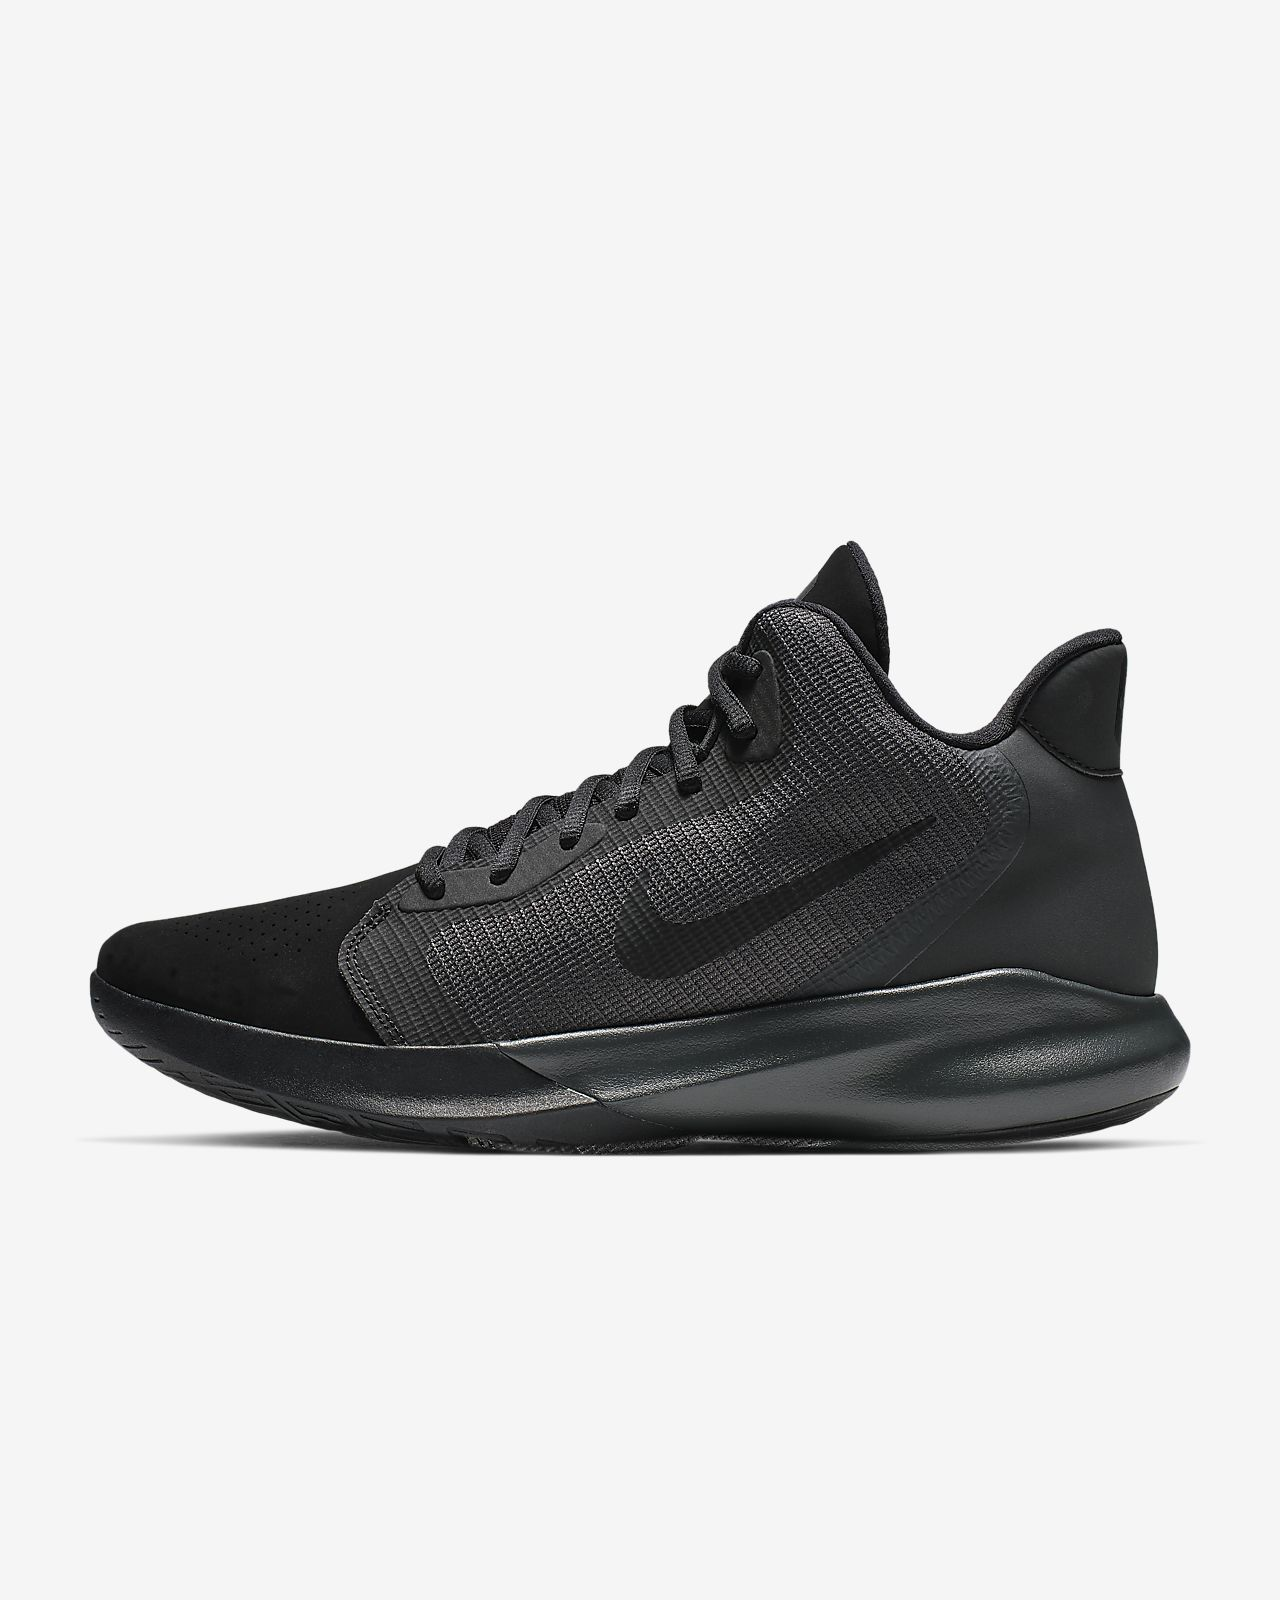 1d4935cd253a Nike Precision III NBK Basketball Shoe. Nike.com